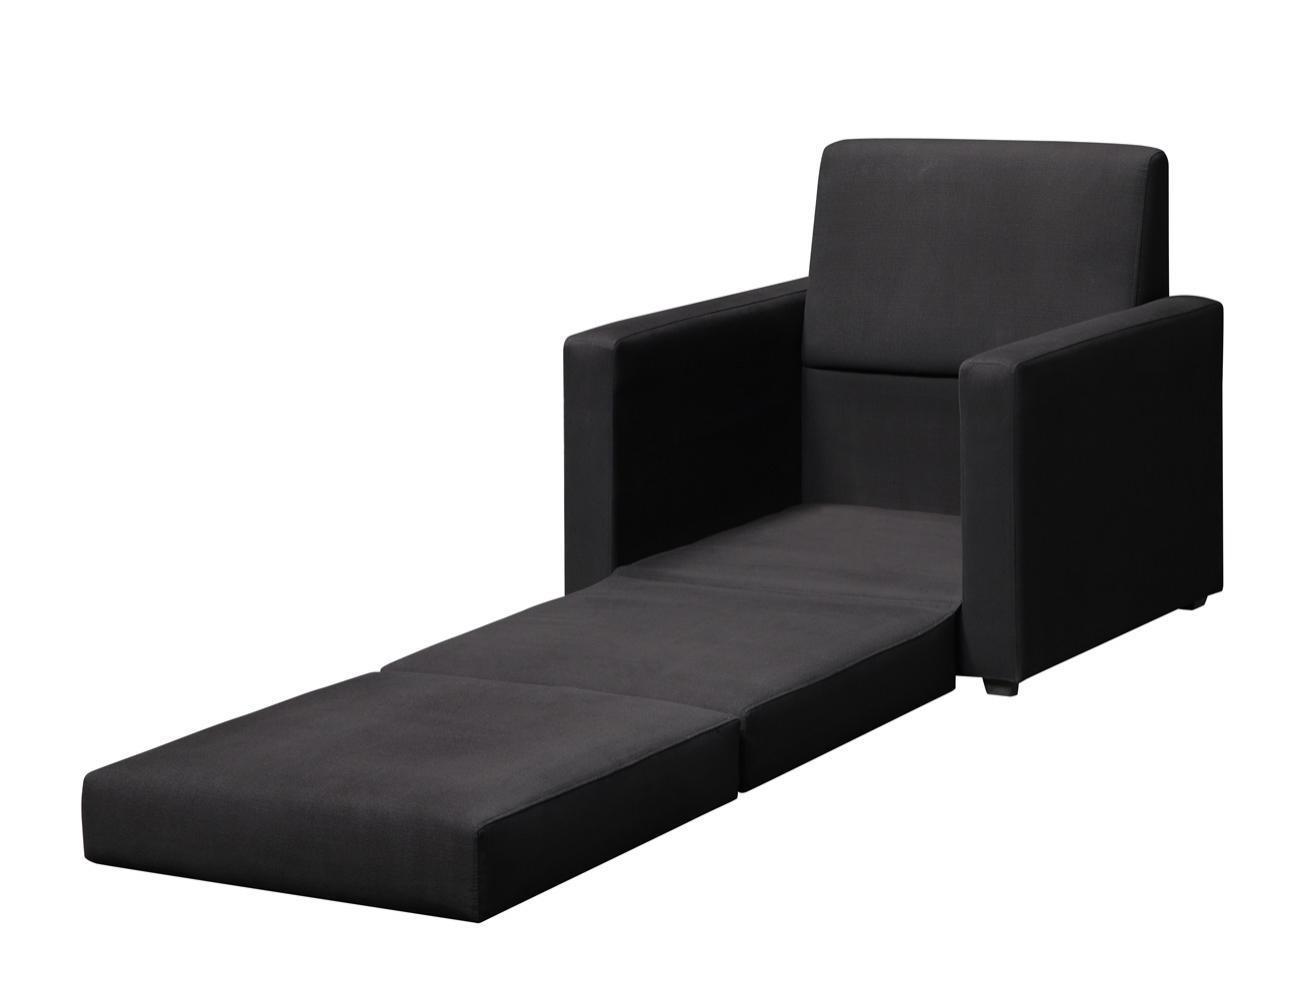 single sleeper chair gravity replacement cord purpose homesfeed